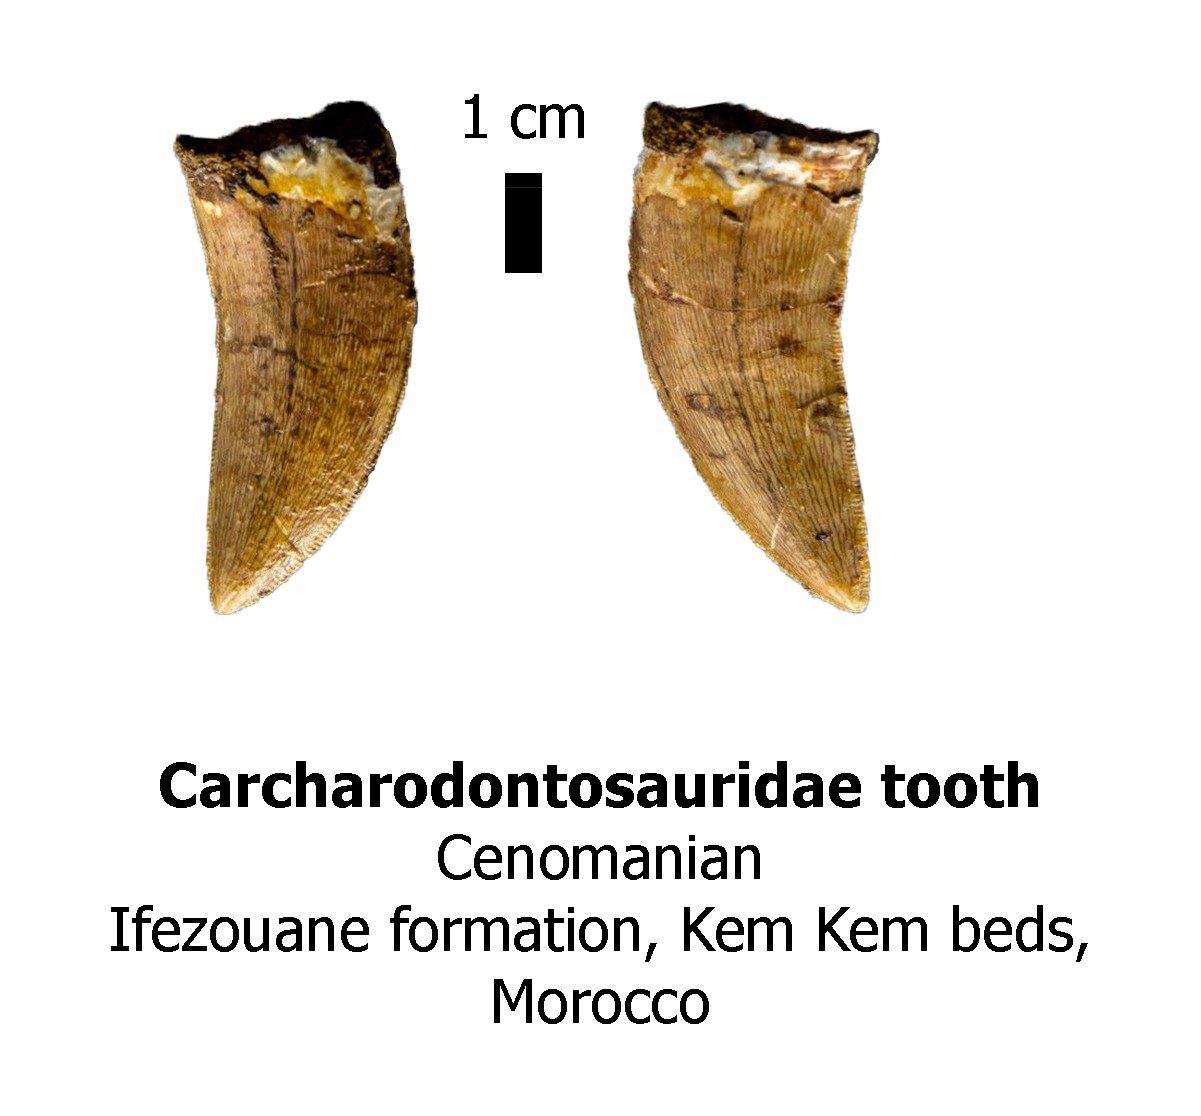 Carcharodontosaurid